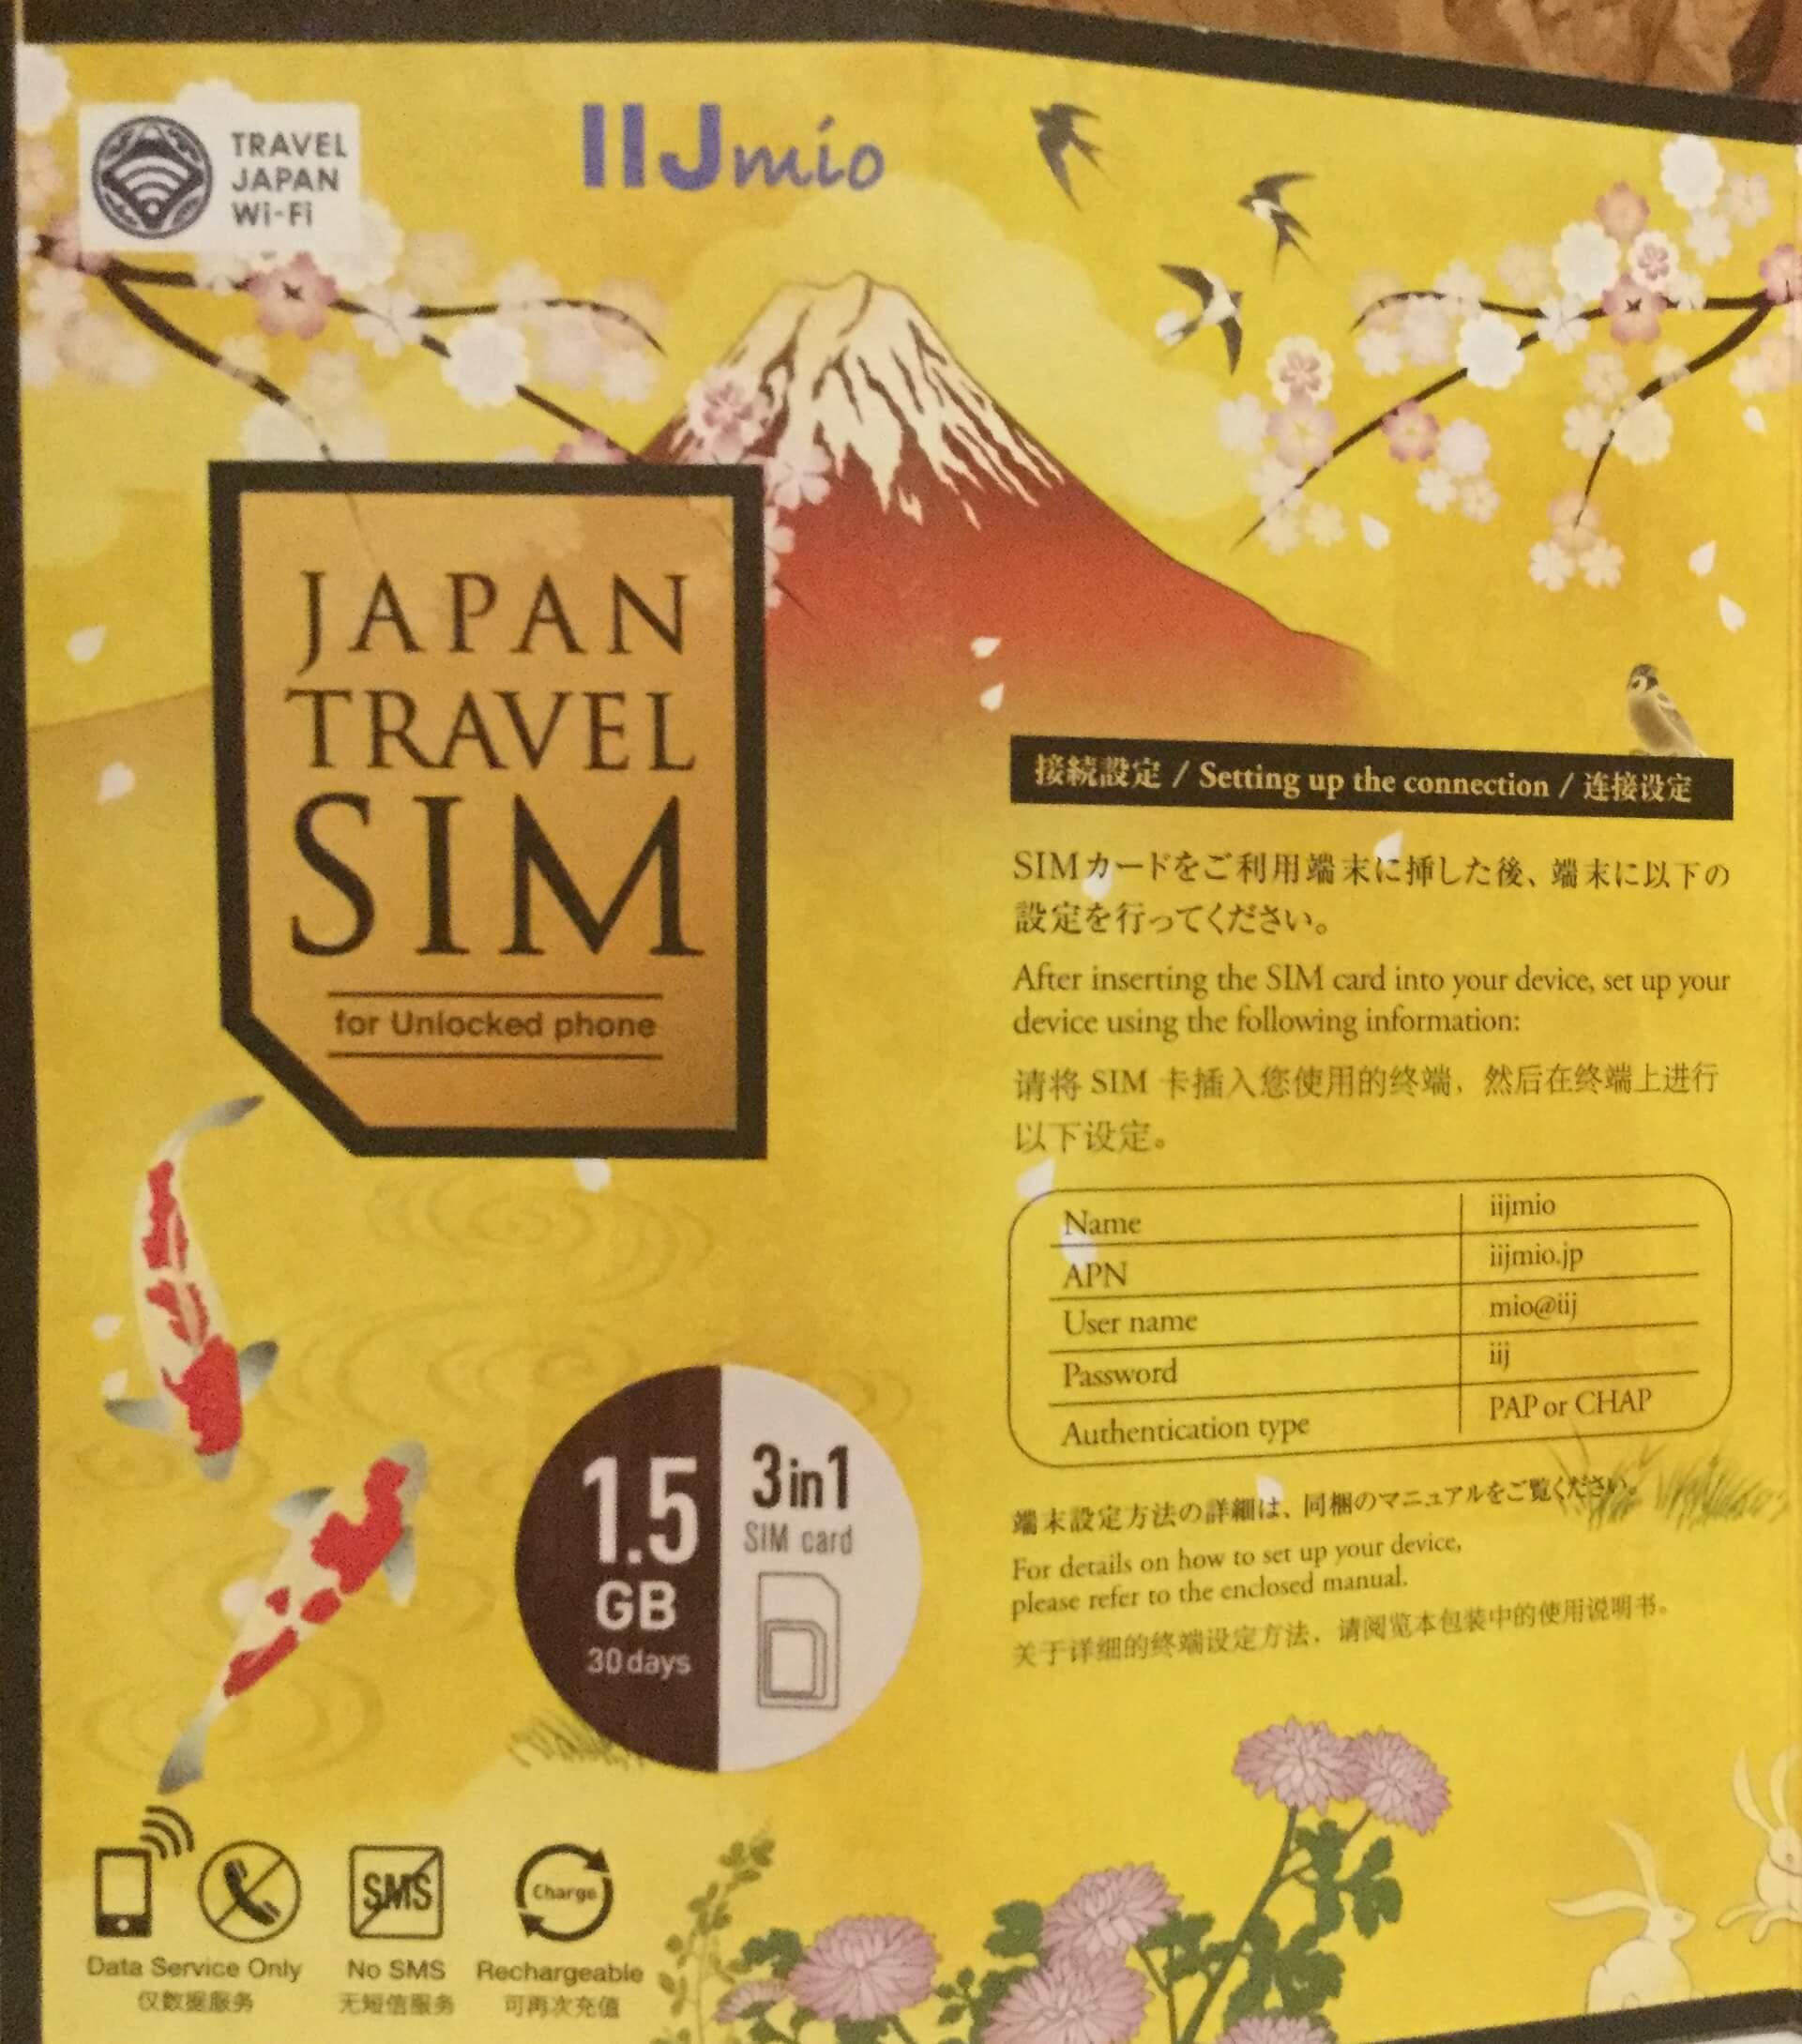 The IIJmio SIM card